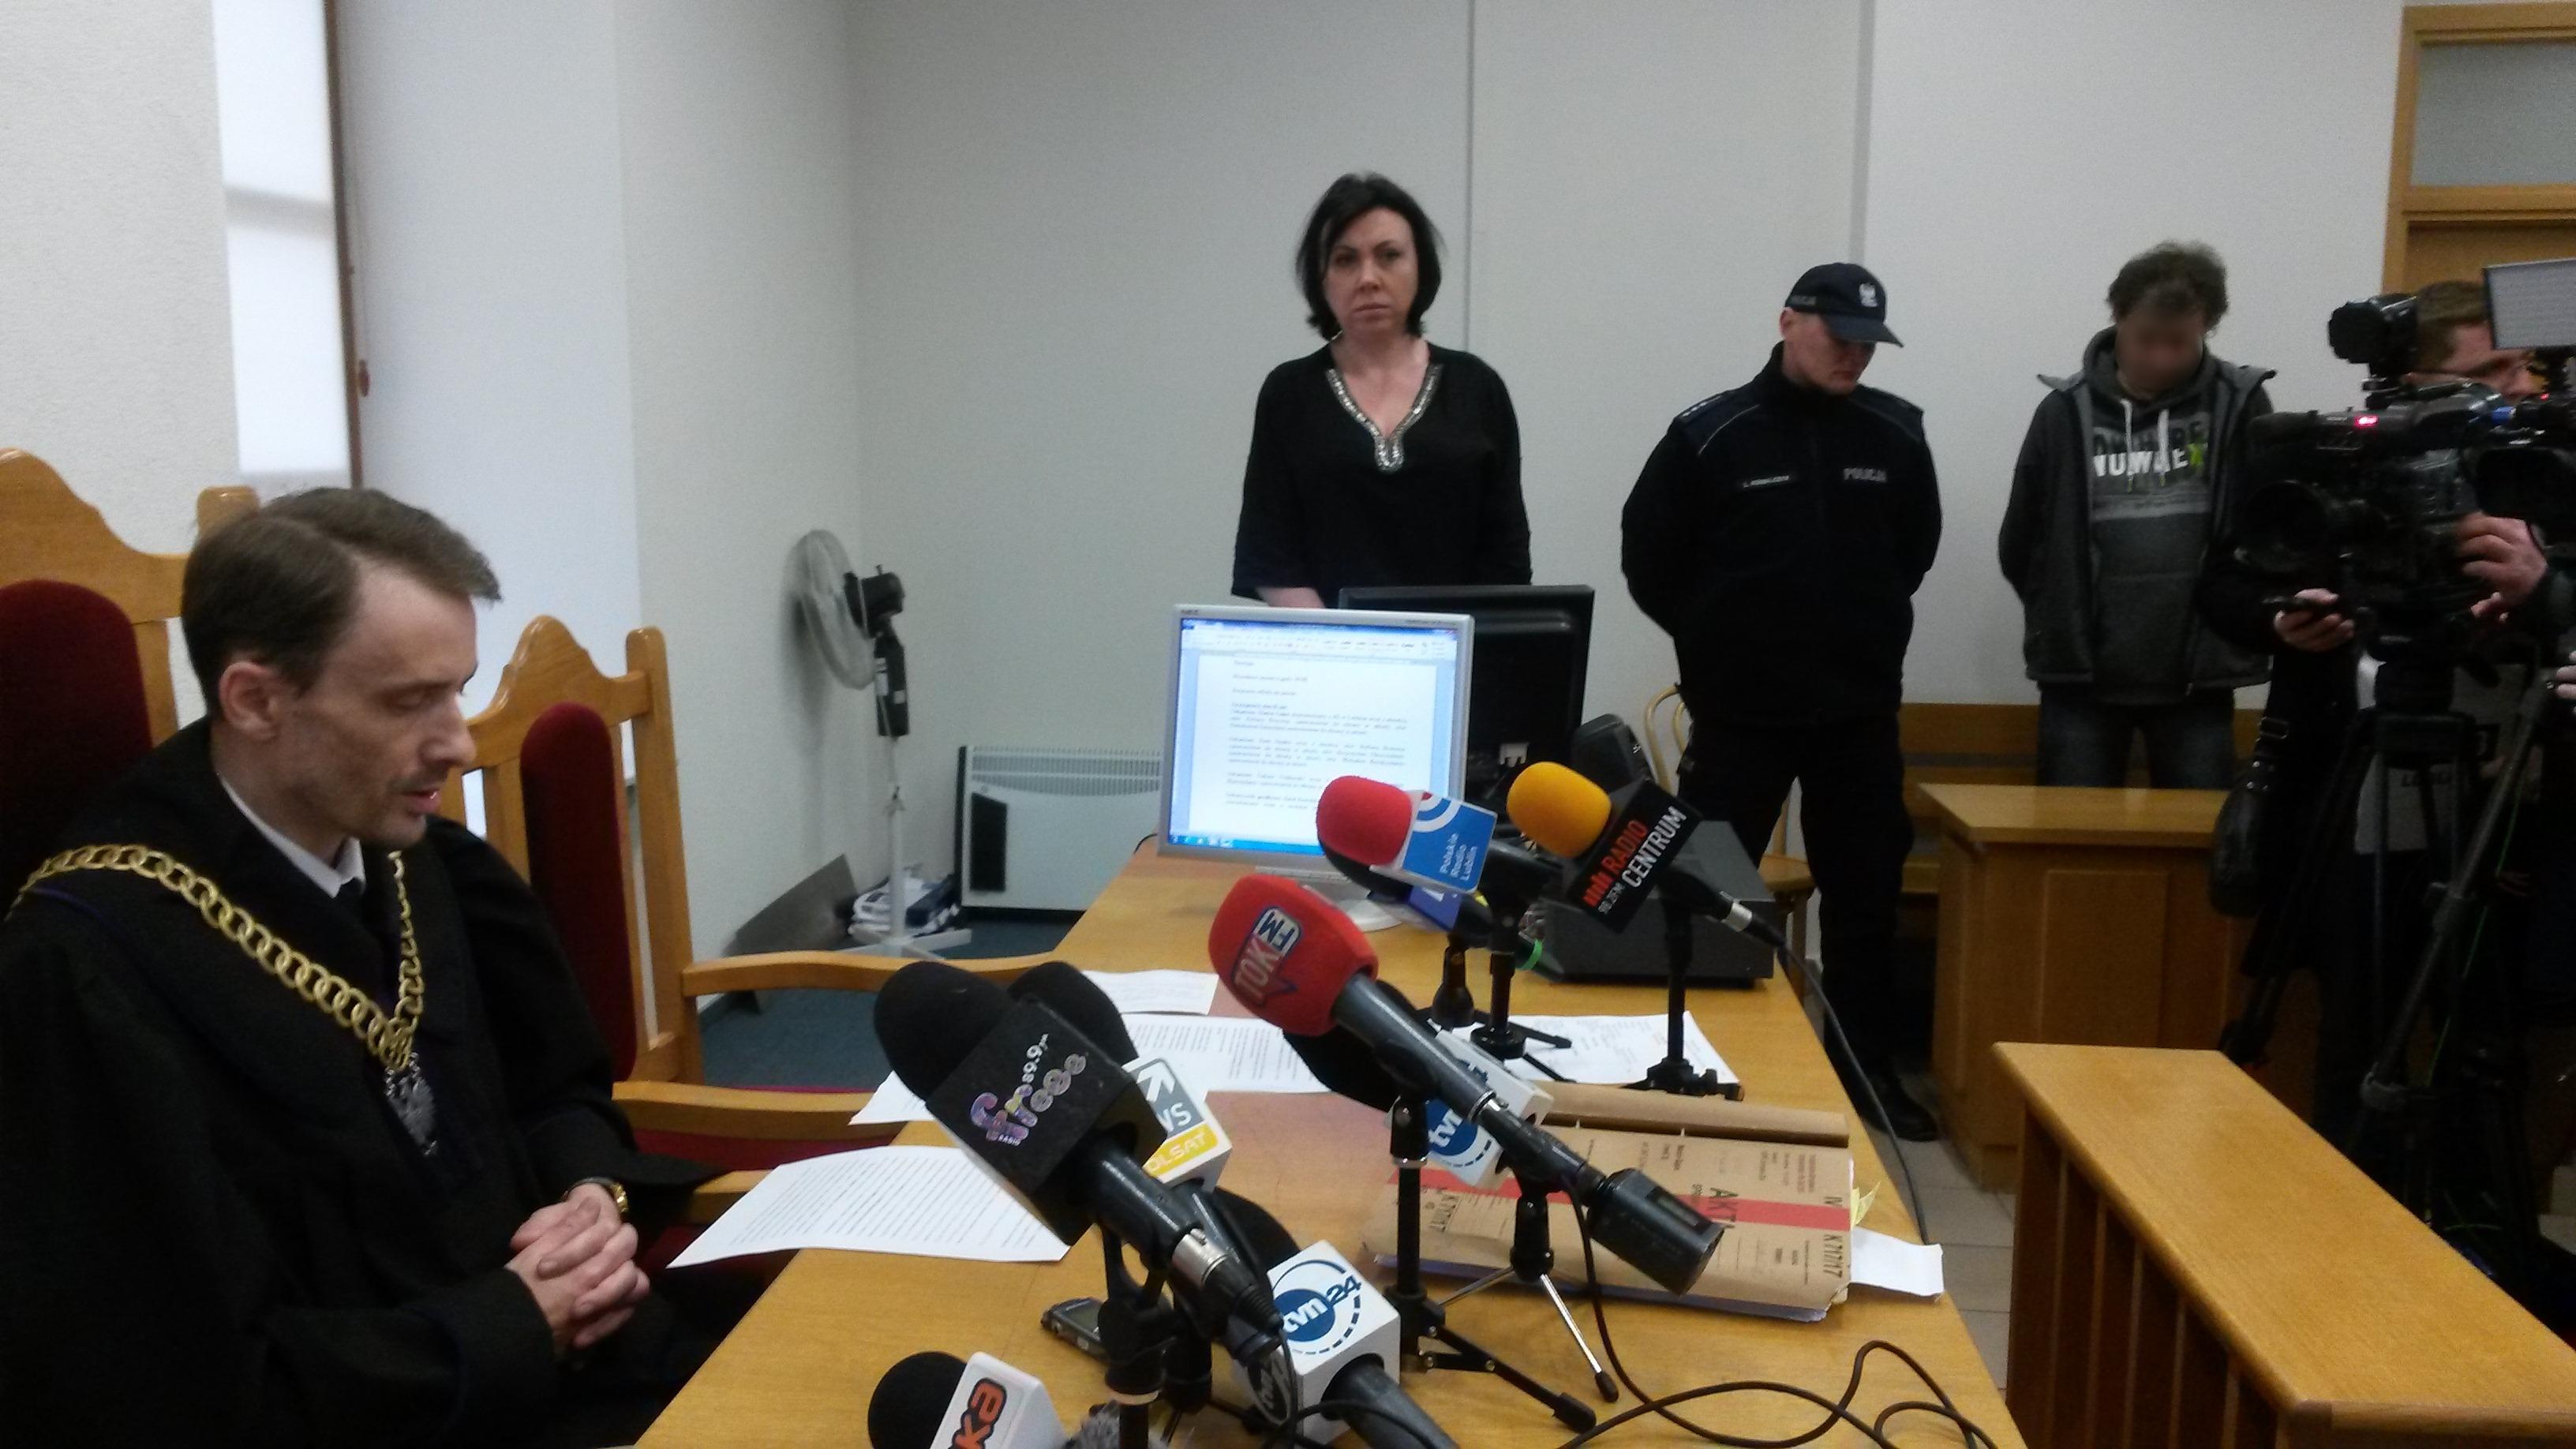 Lubelscy policjanci skazani